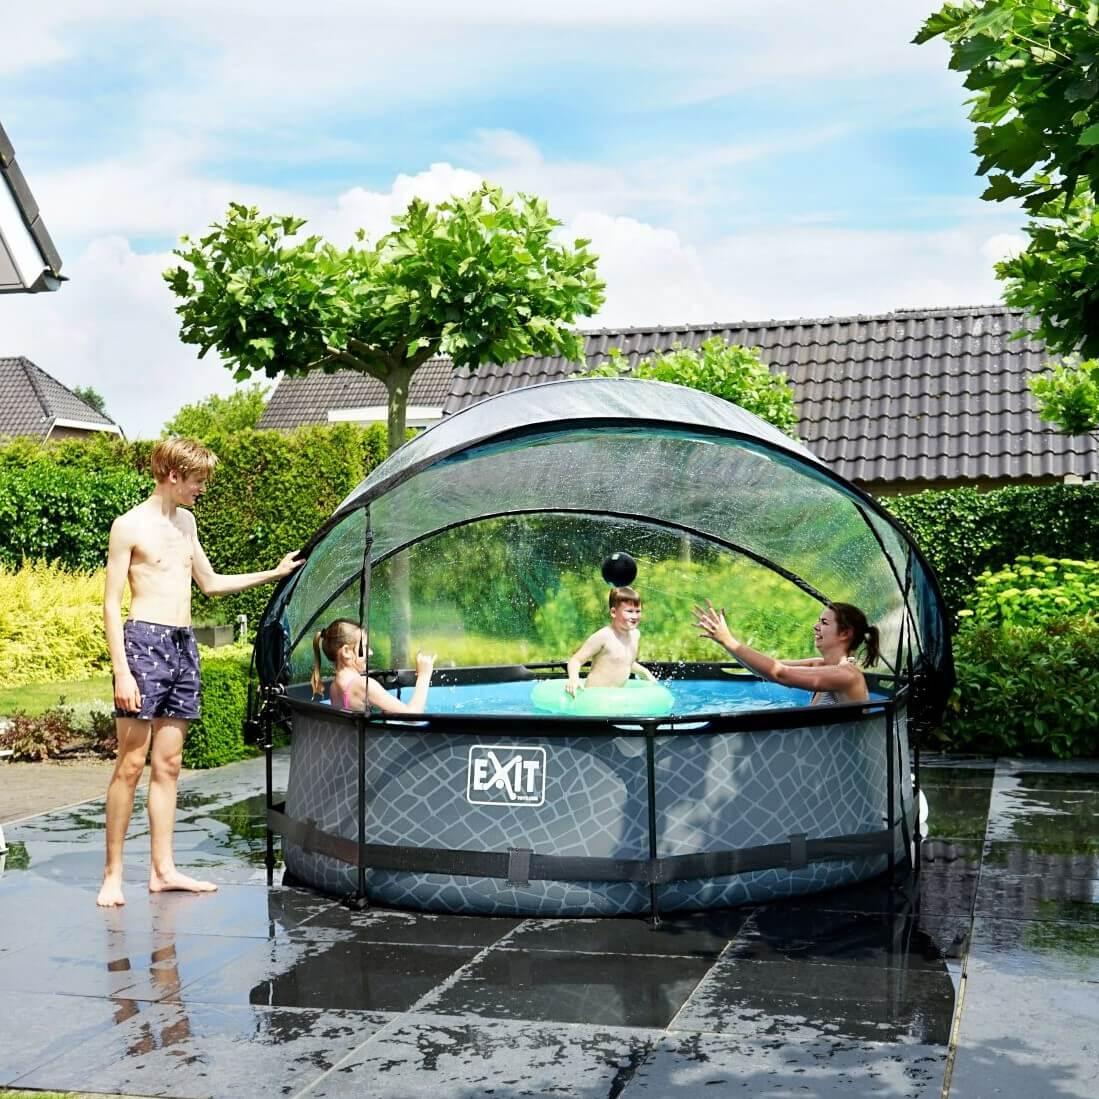 Exit Pools kaufen auf spiel-preis.de